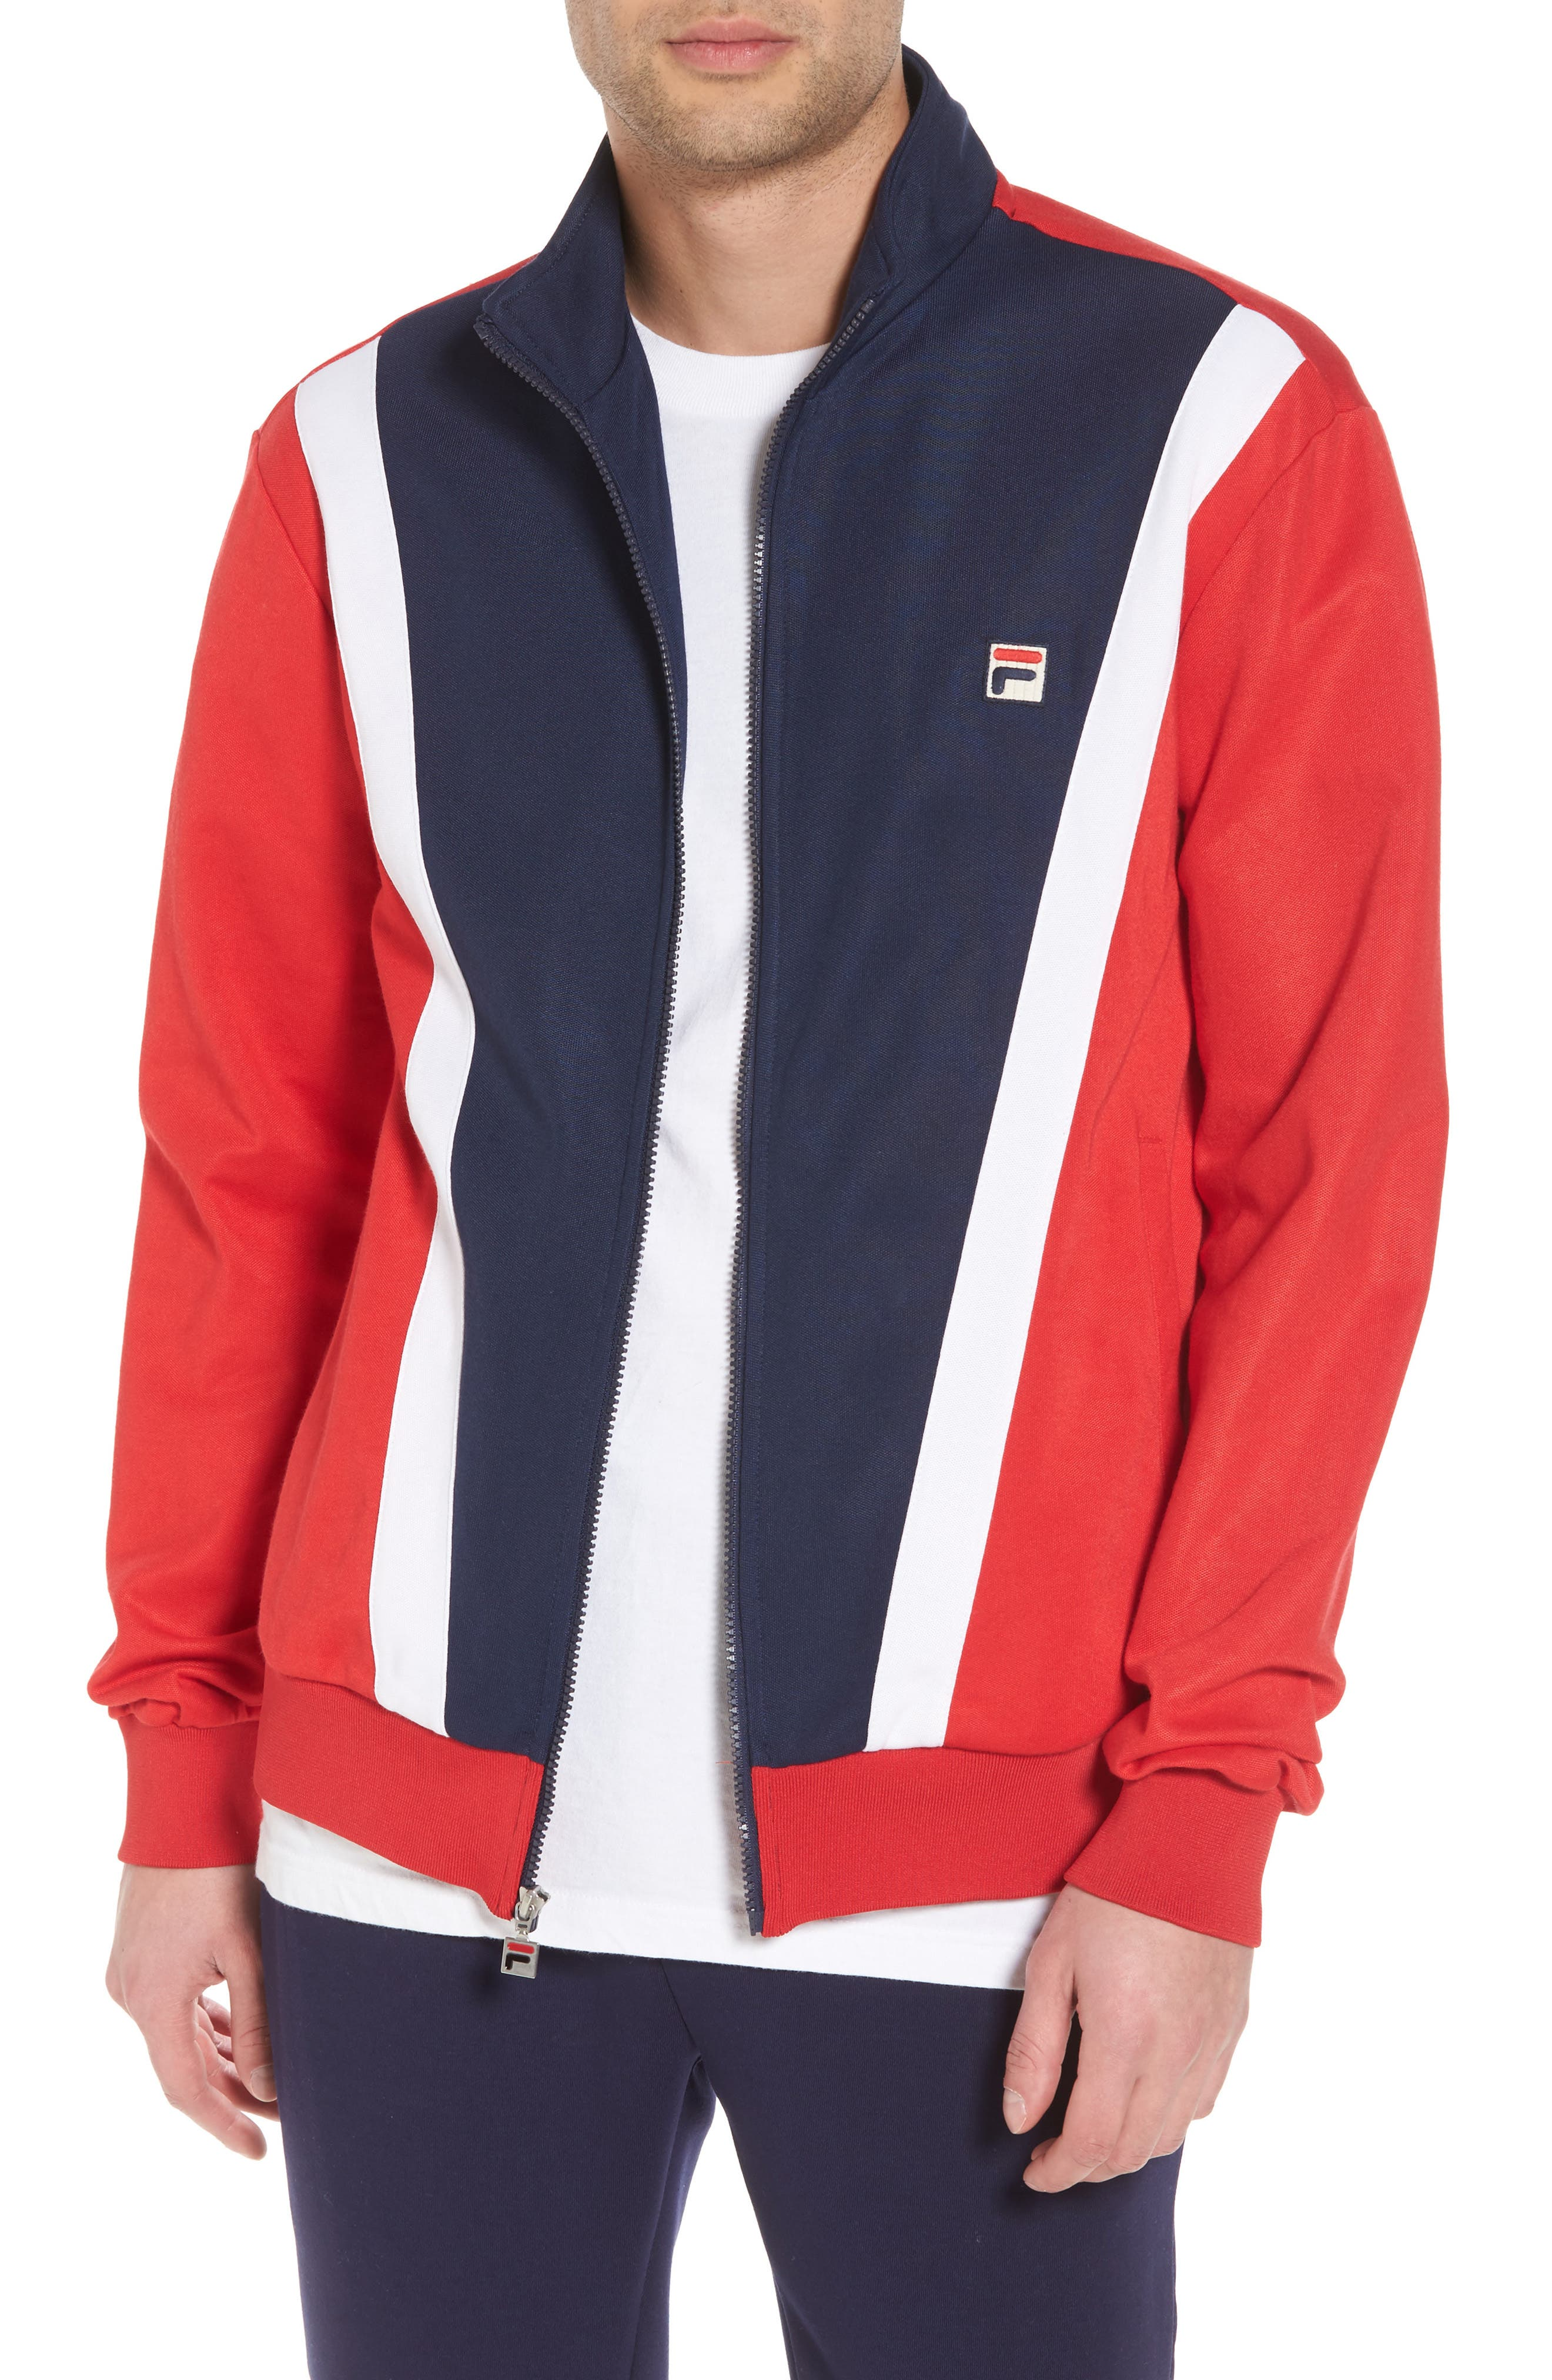 Alternate Image 1 Selected - FILA Grosso Jacket